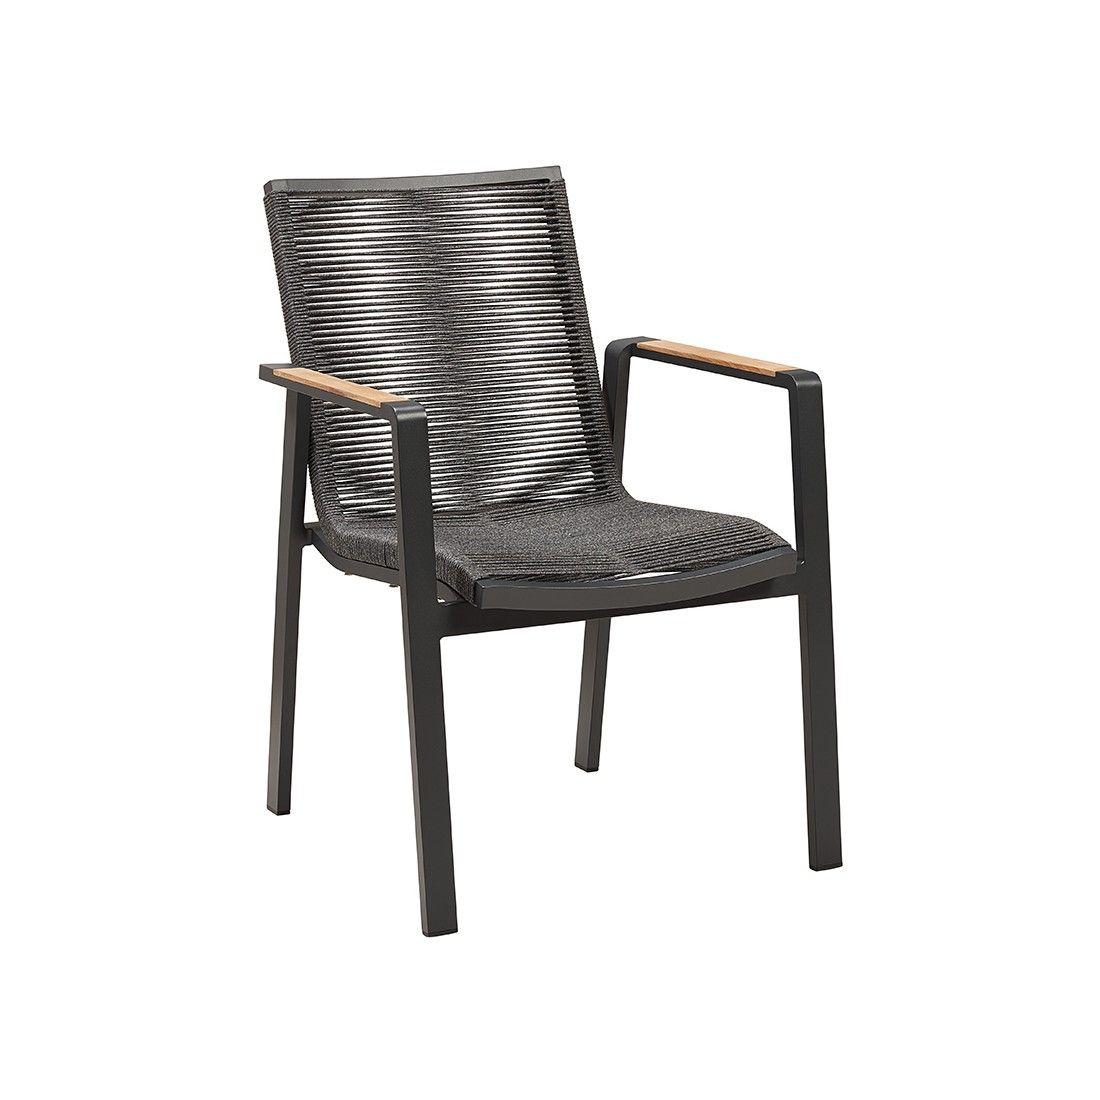 Large fauteuil de table de jardin en alu et tissu Olefin avec accoudoirs en teck, empilable, Moreno de Gescova